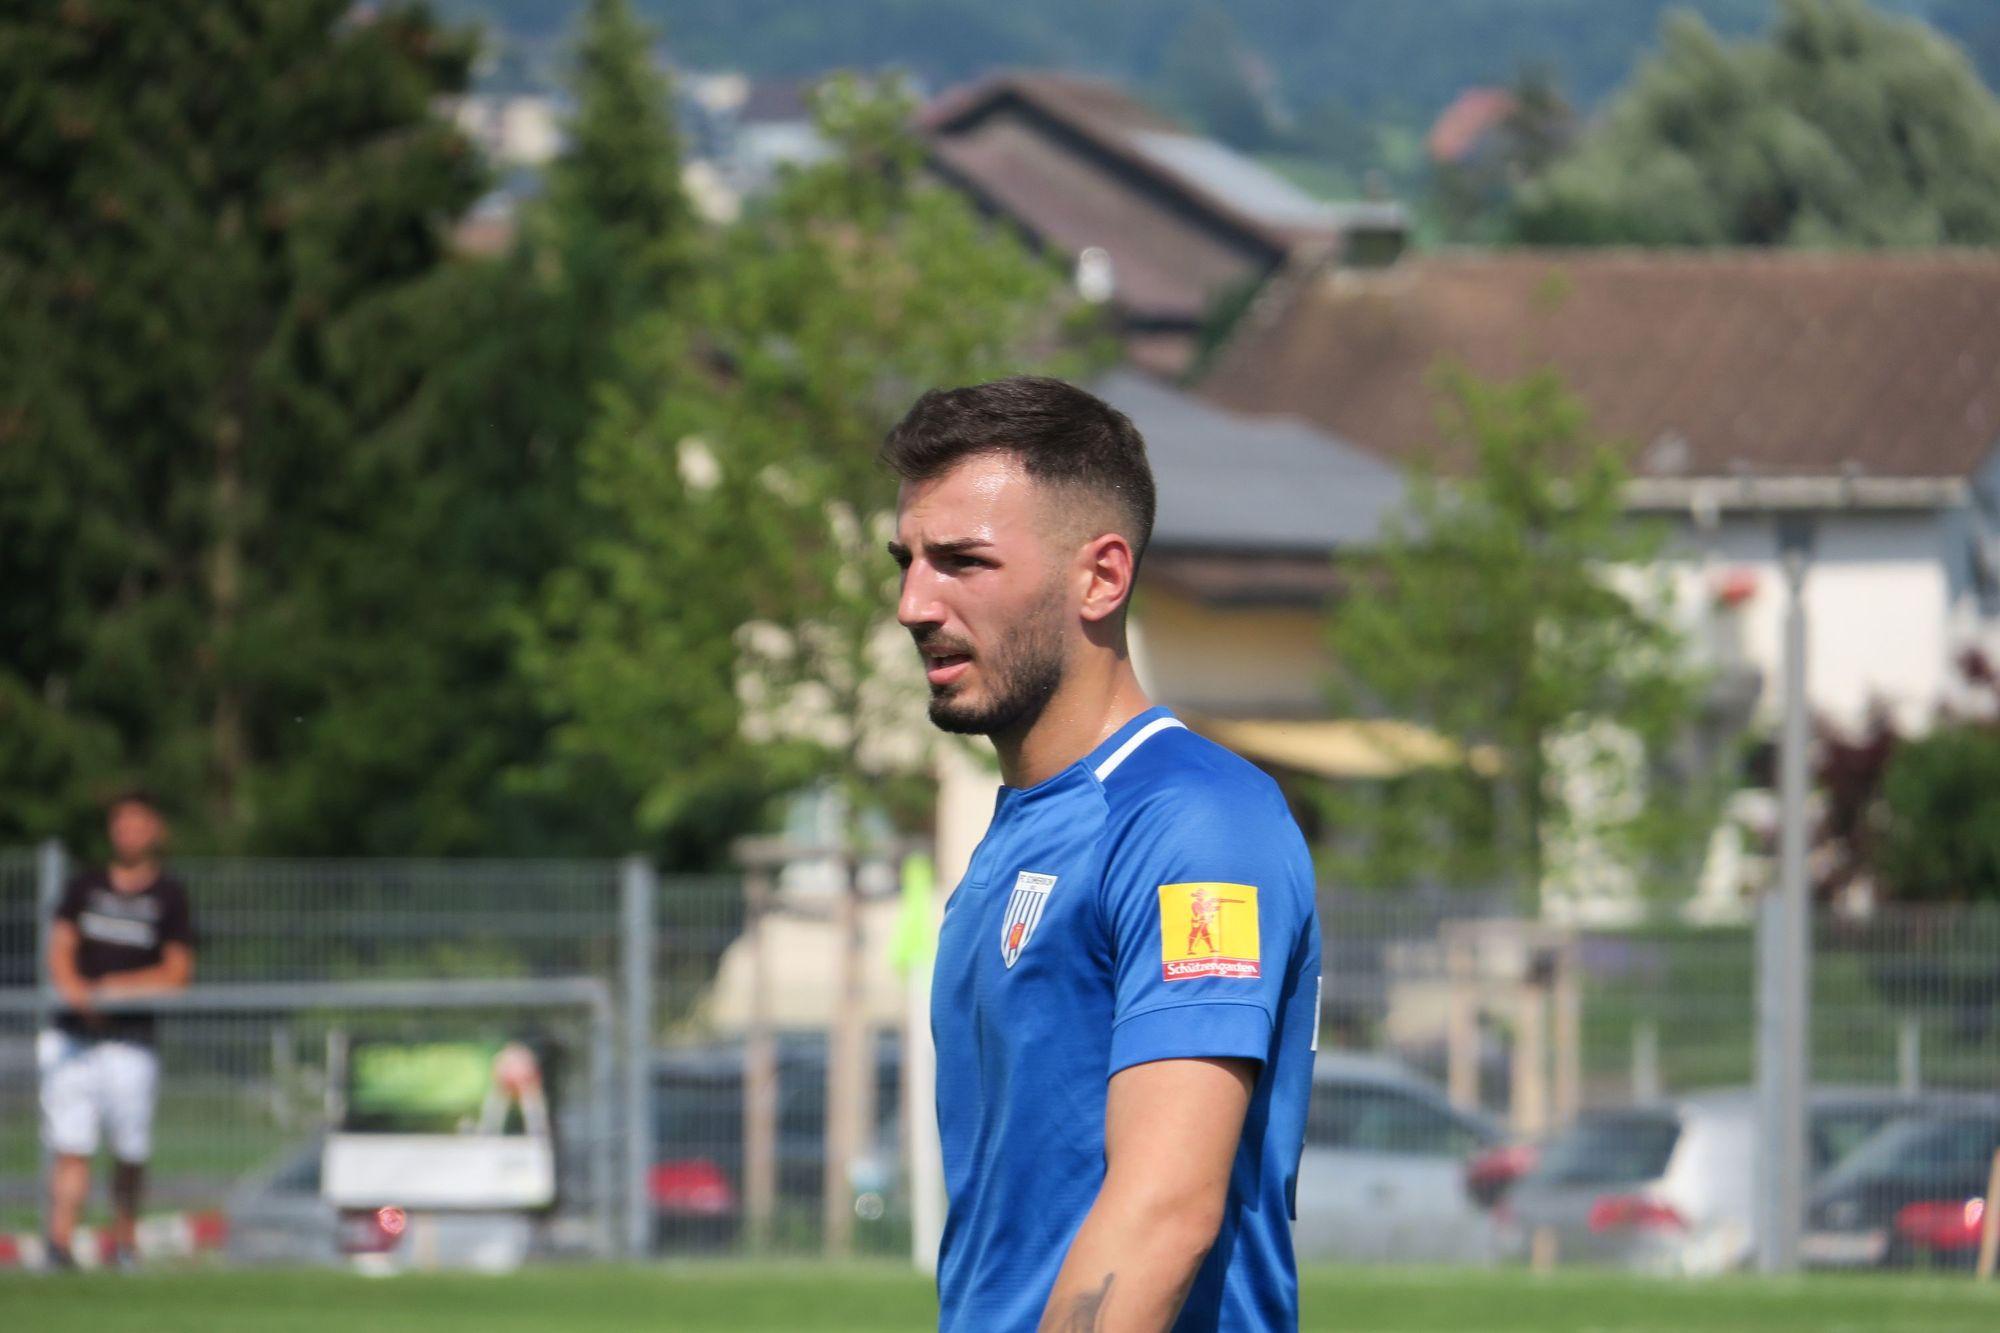 Gjejson Lleshaj vom FC Schmerikon am letzten Match gegen den FC Eschenbach am 26. Juni 2021 (Foto: Thomas Müller, 8716.ch)